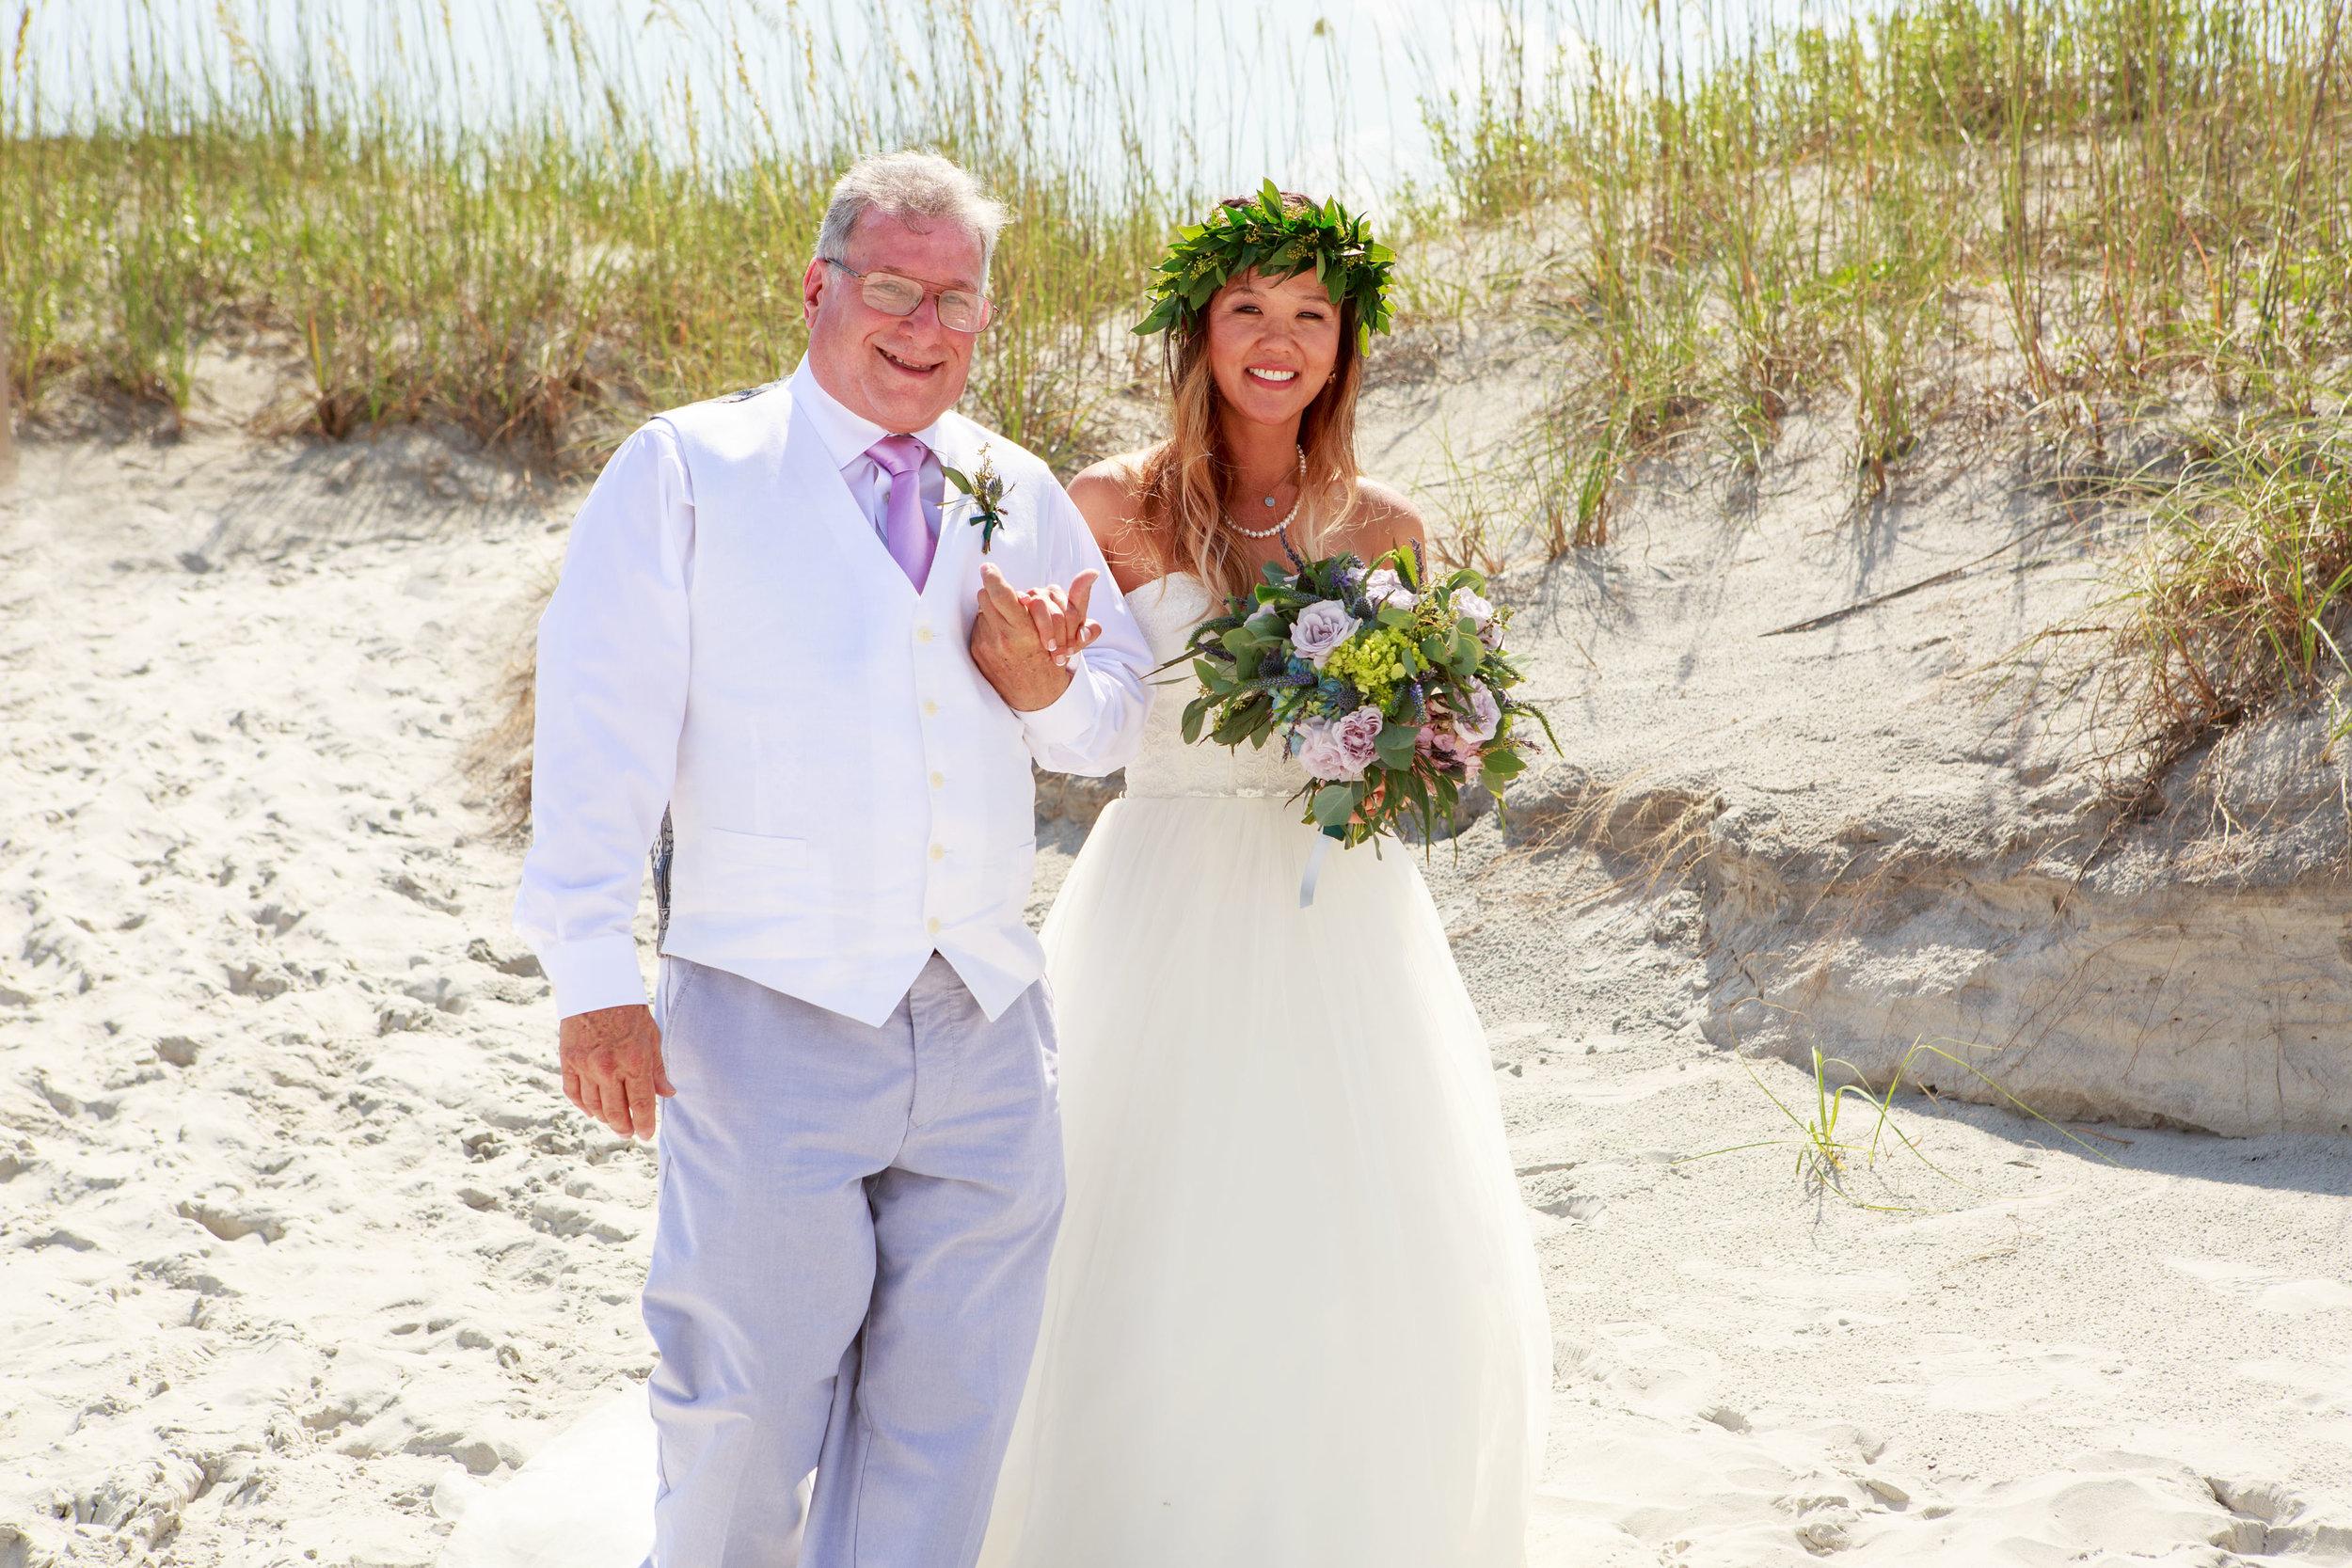 North_Carolina_Wedding_Photographer_Tiffany_Abruzzo_Ceremony_17.jpg